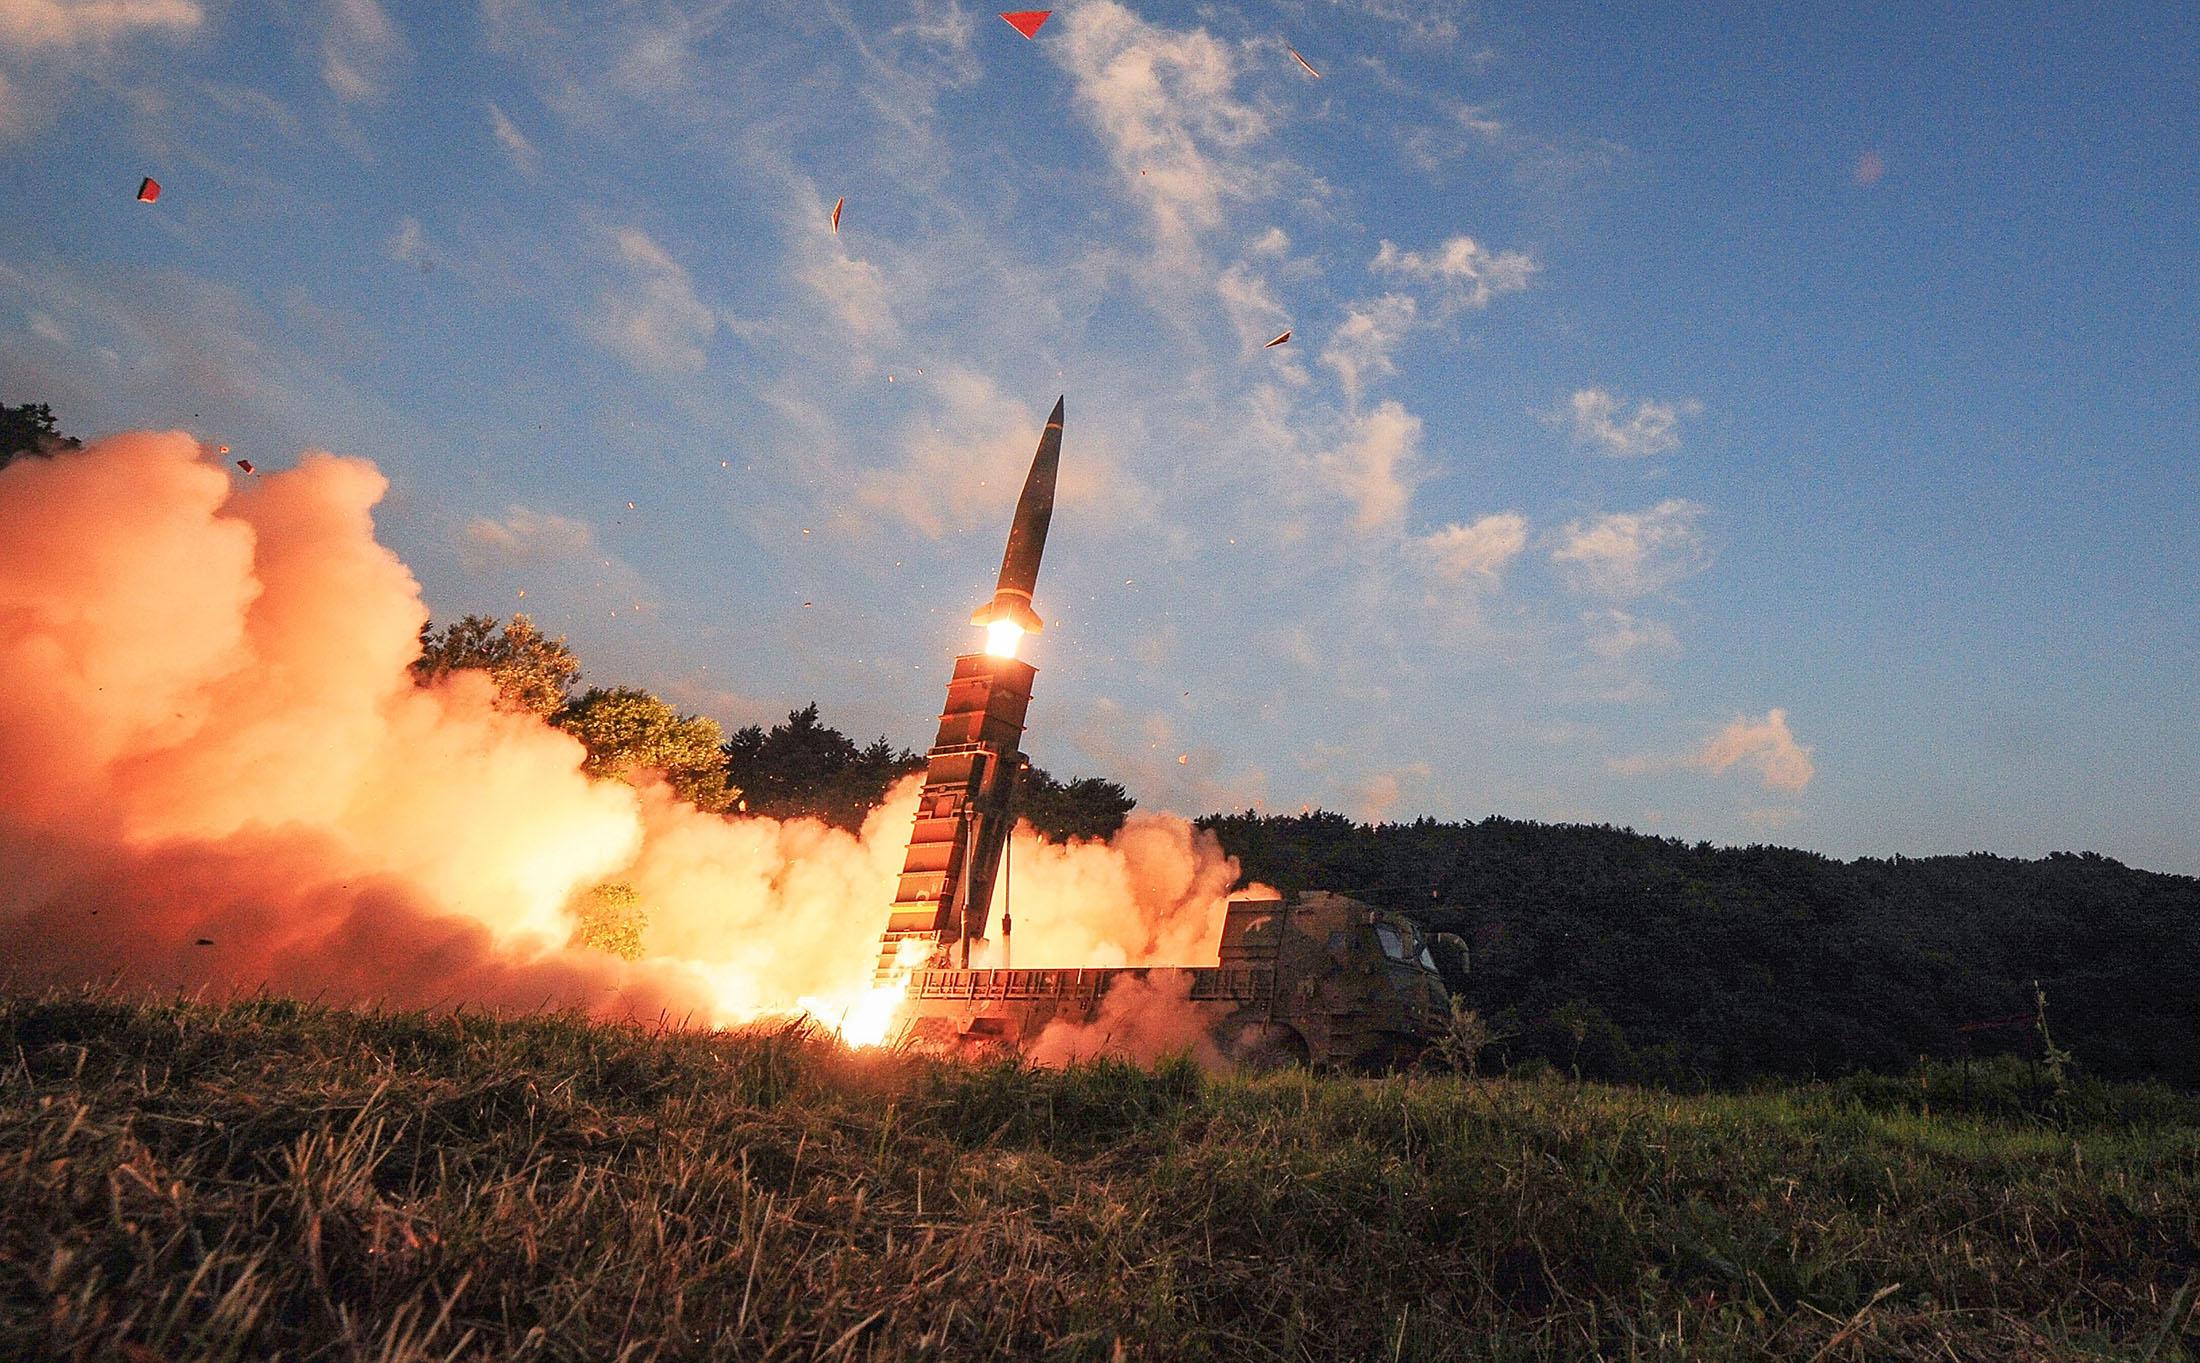 North Korea prepares for possible ICBM launch …US reaction?